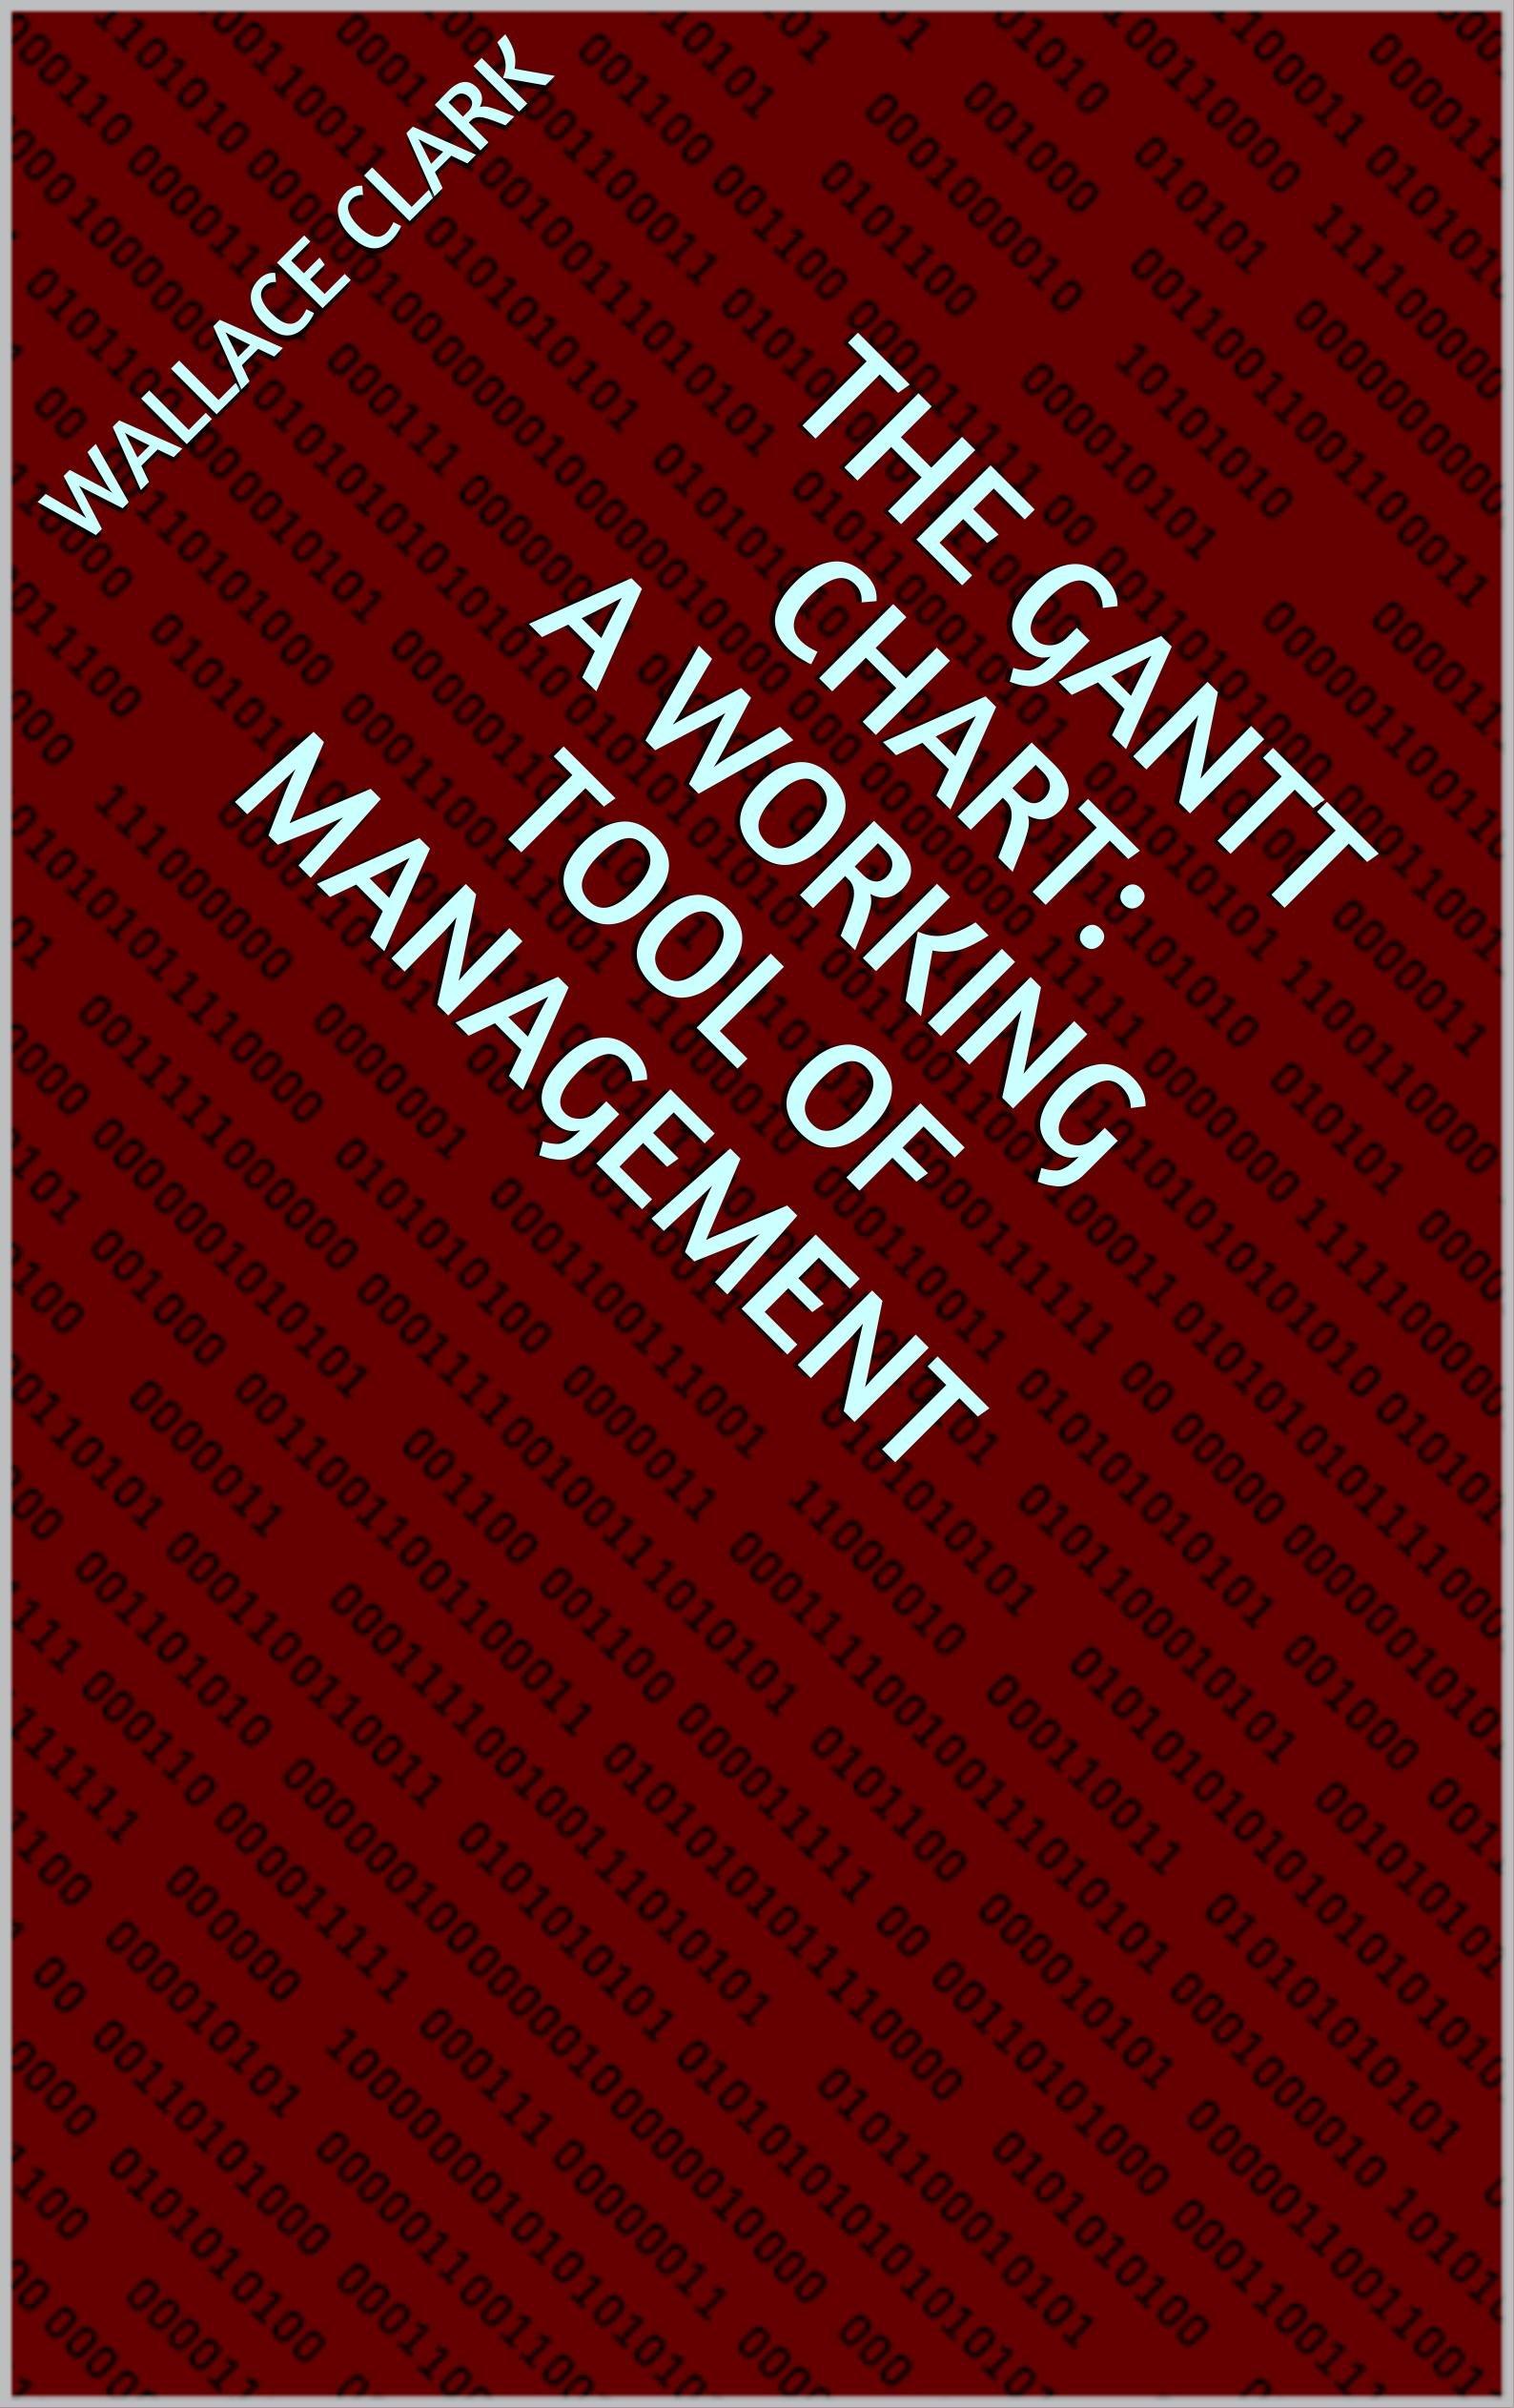 The Gantt Chart: A Working Tool of Management